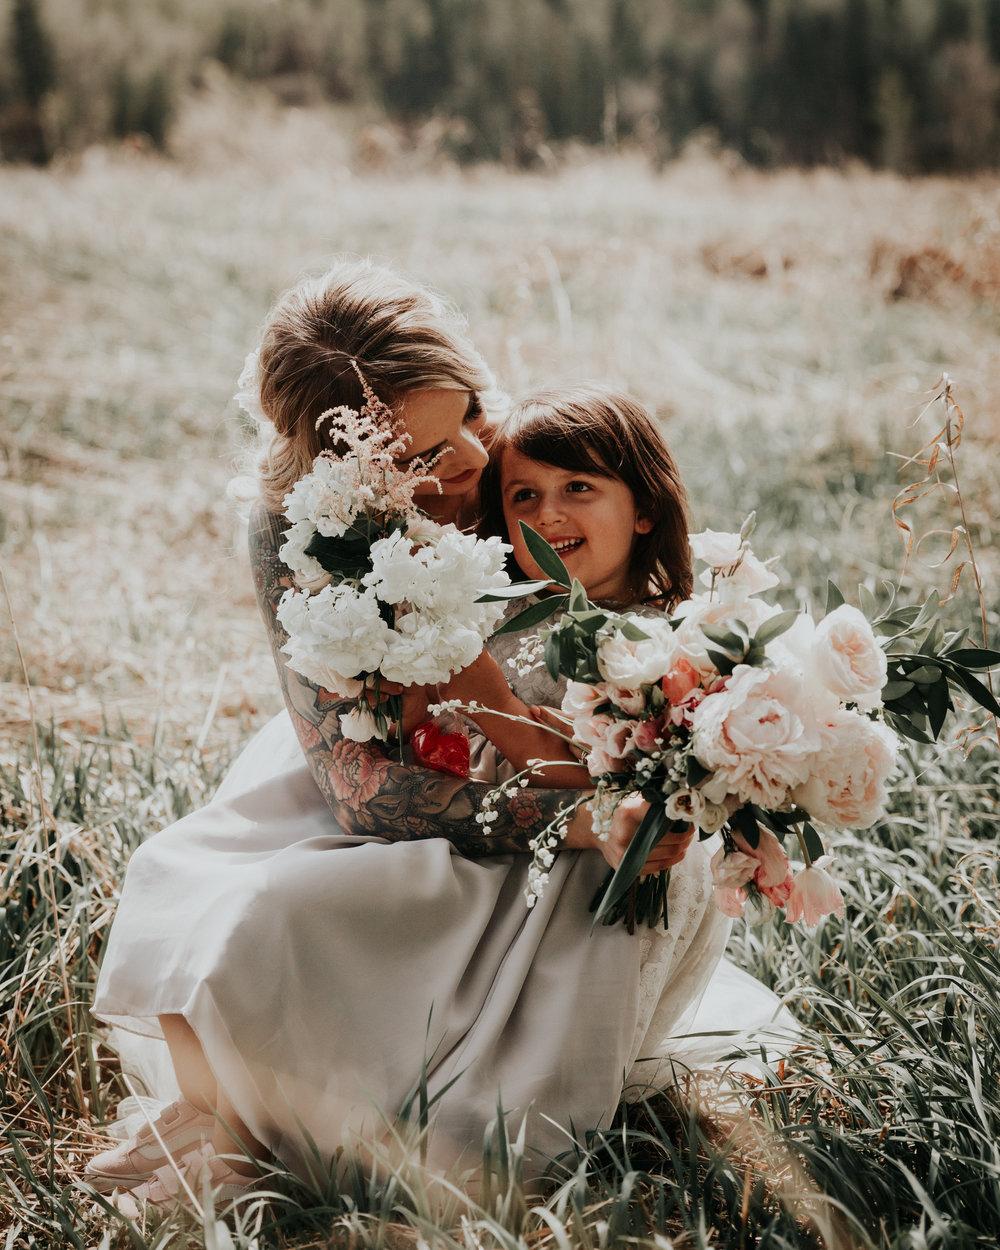 Walters Wedding Favourites - JayRMcDonald (6 of 18).JPG